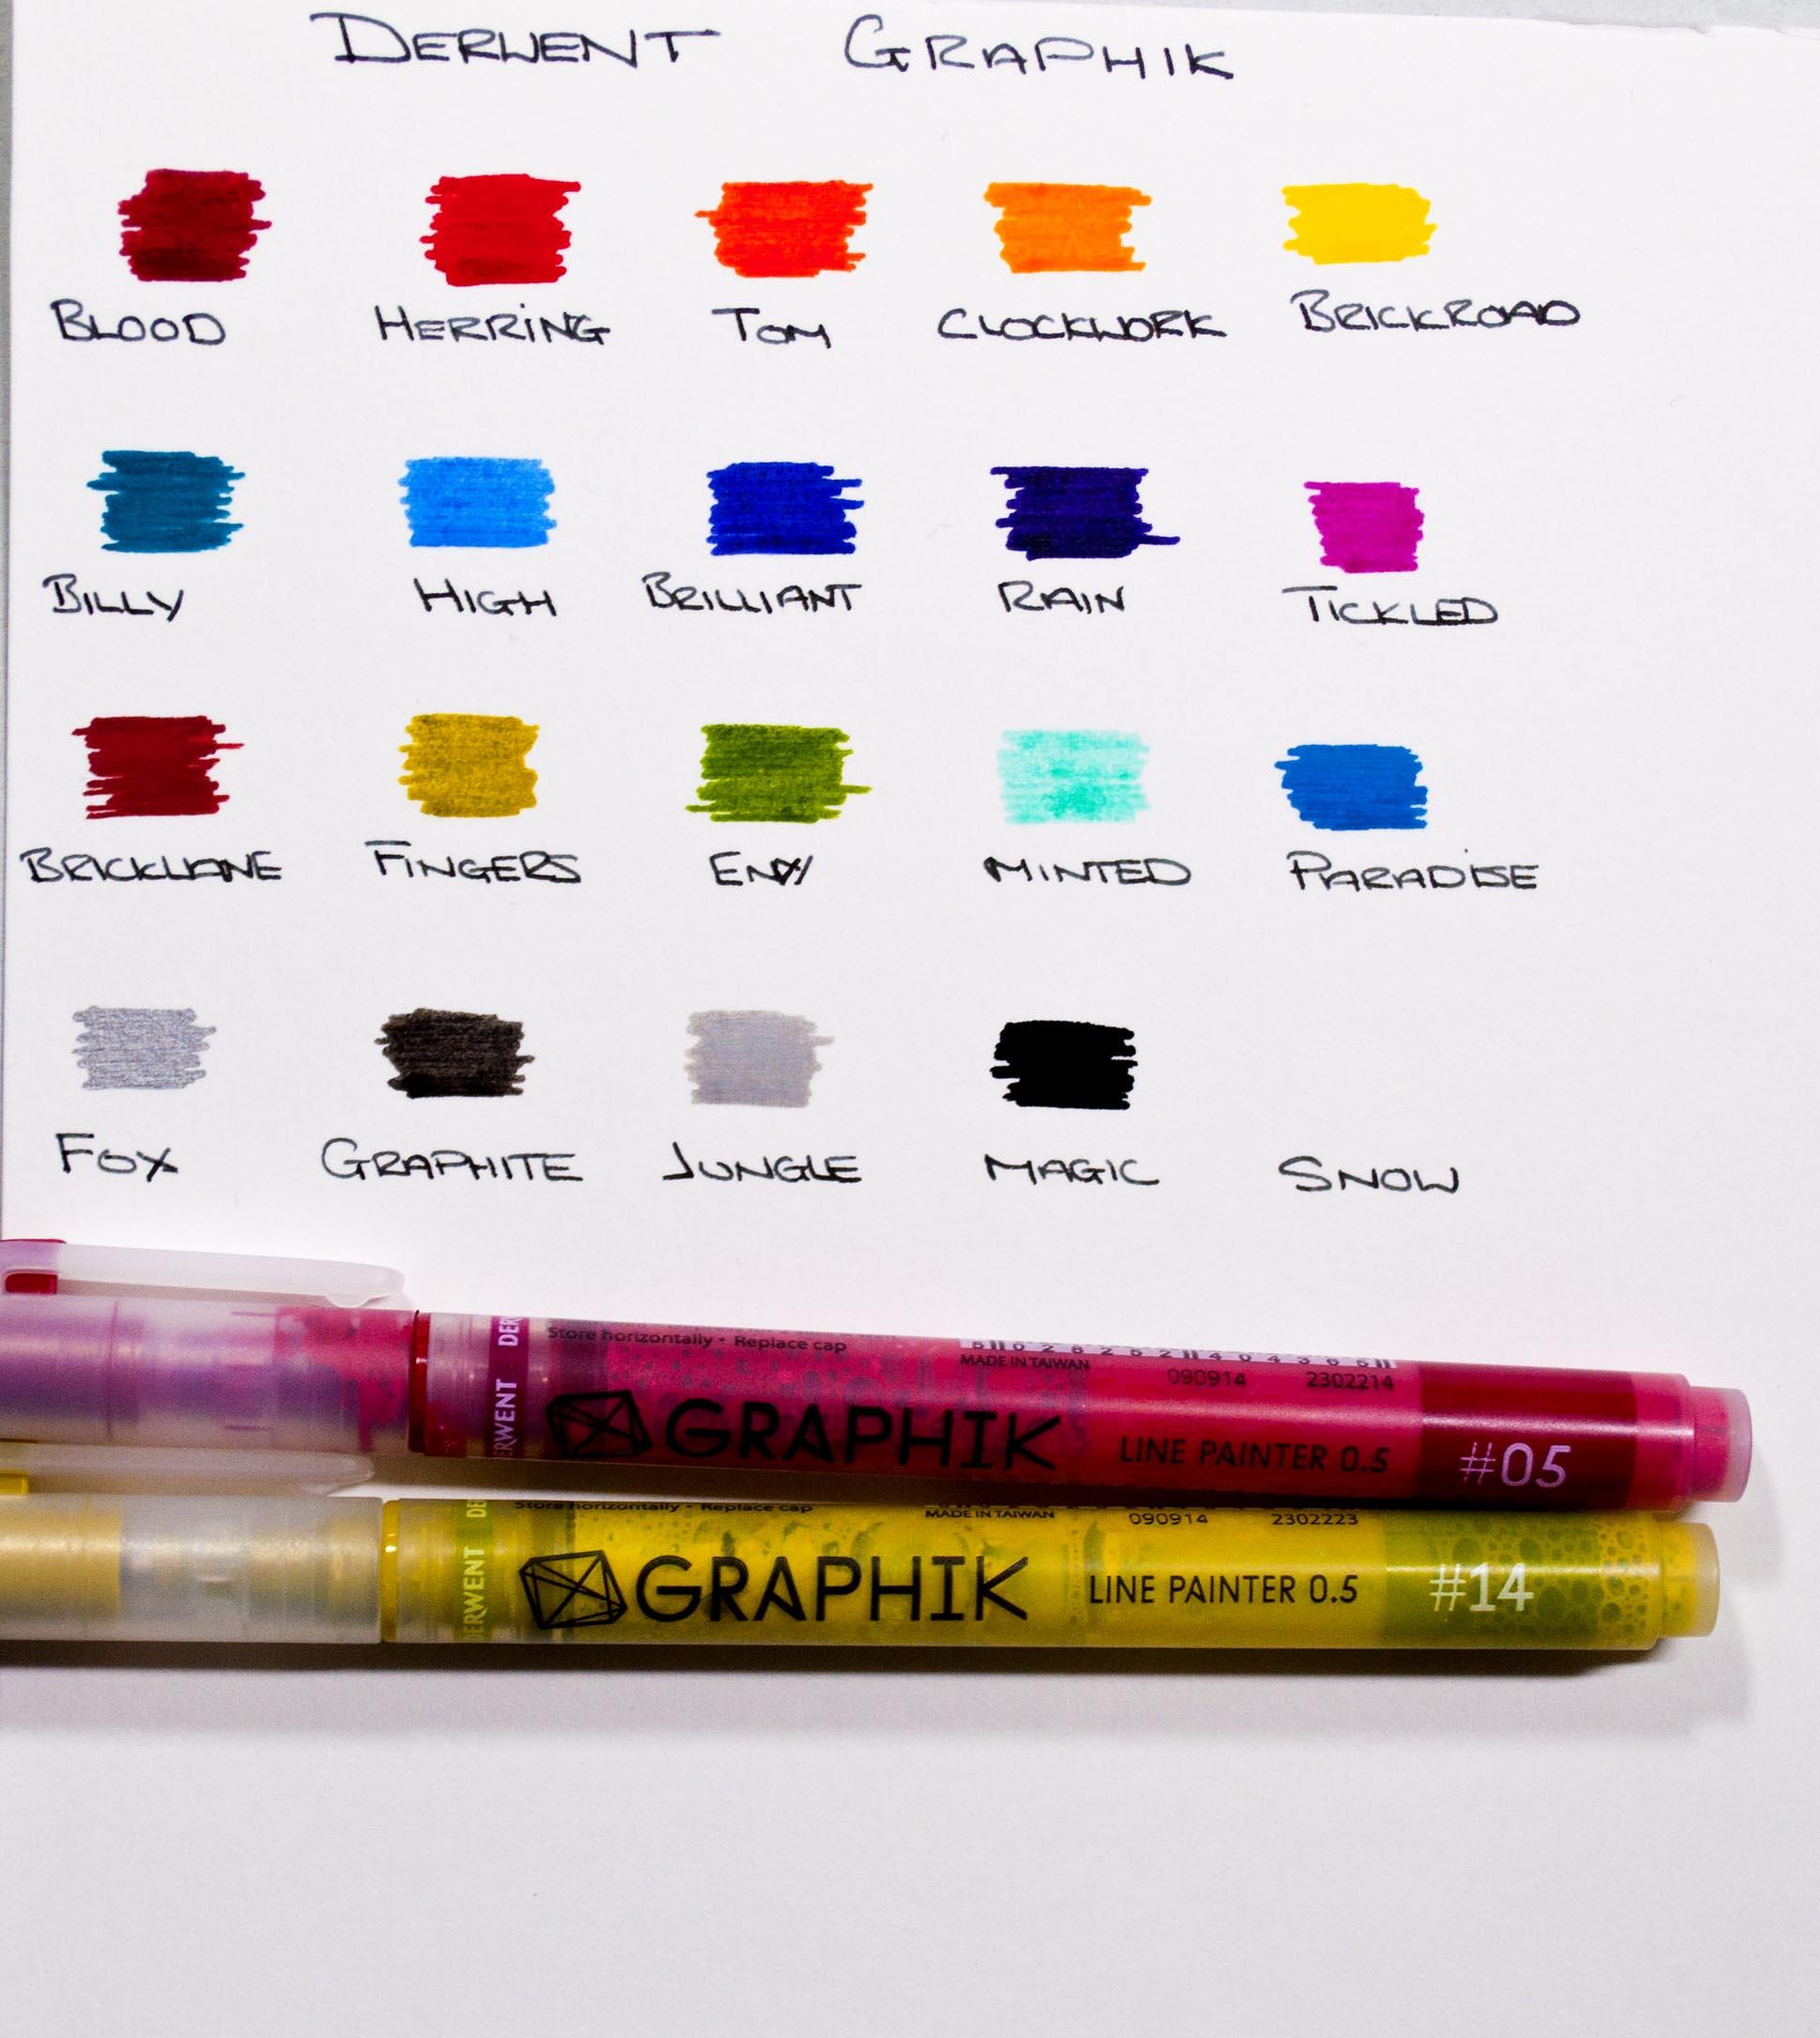 Graphik Swatch Colour Chart Best .jpg